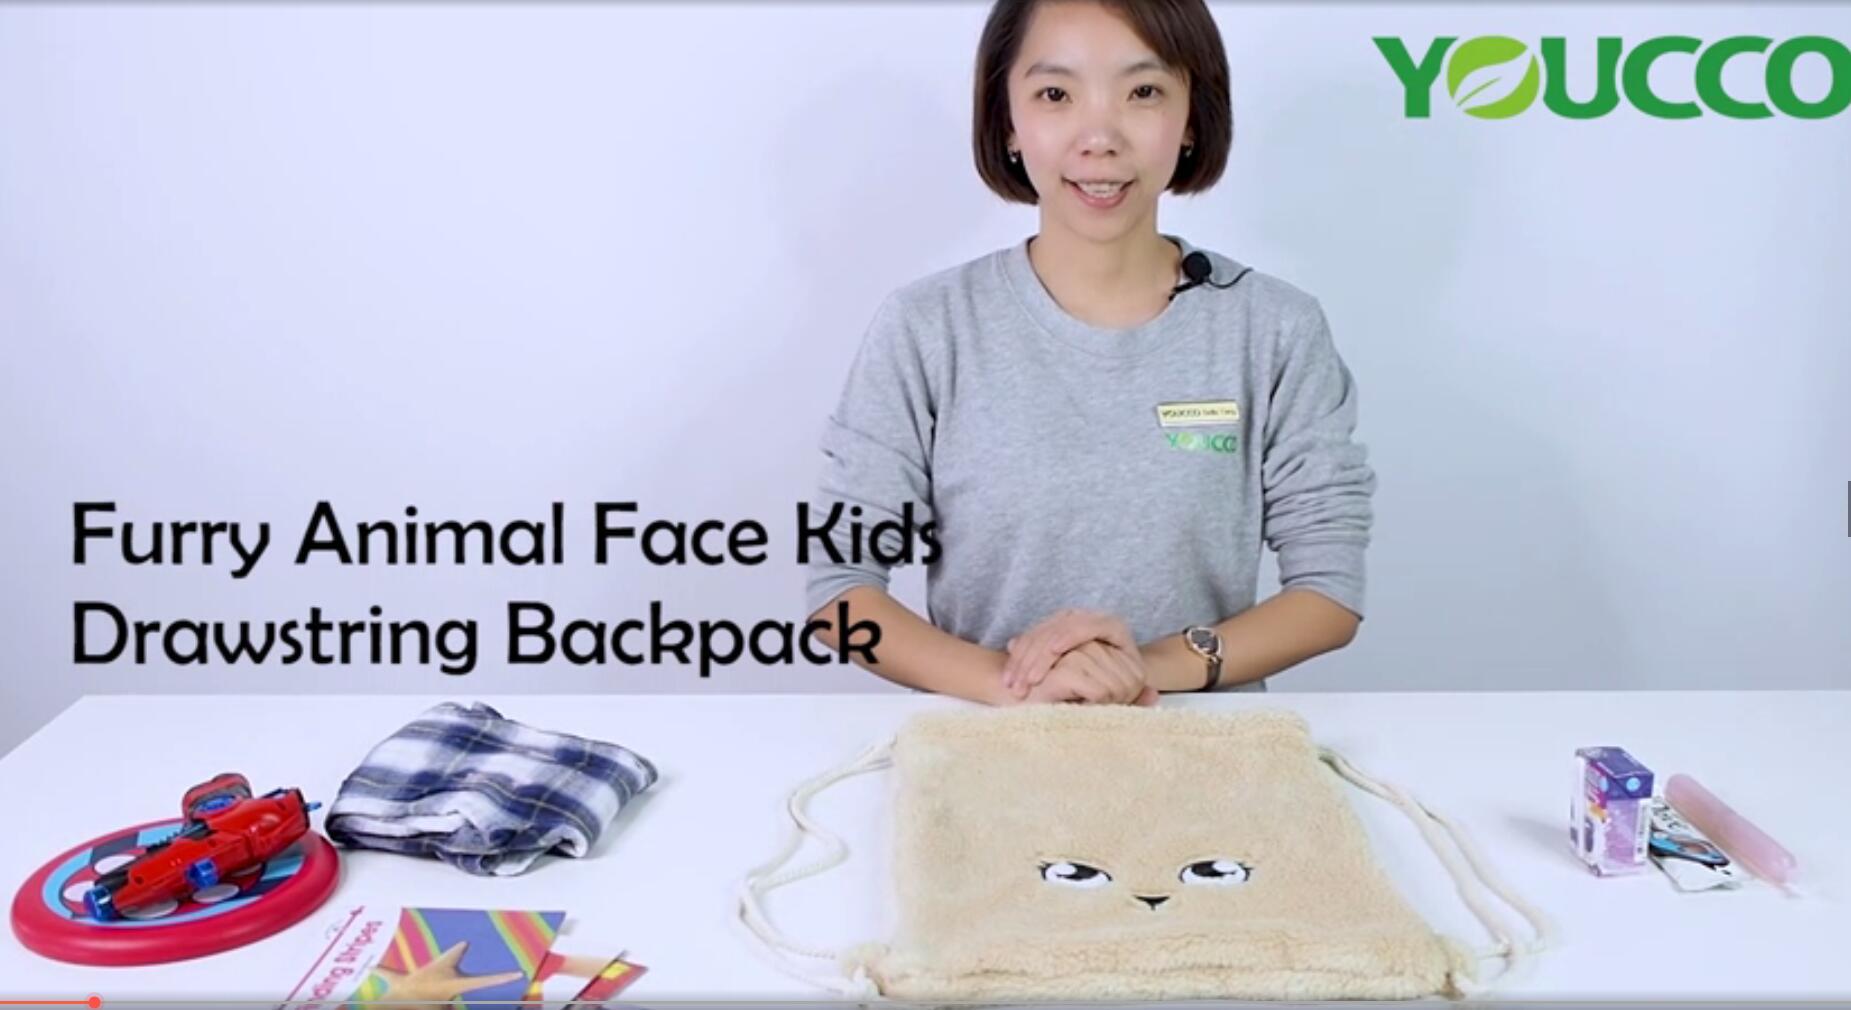 Furry Animal Face Kids Drawstring Backpack